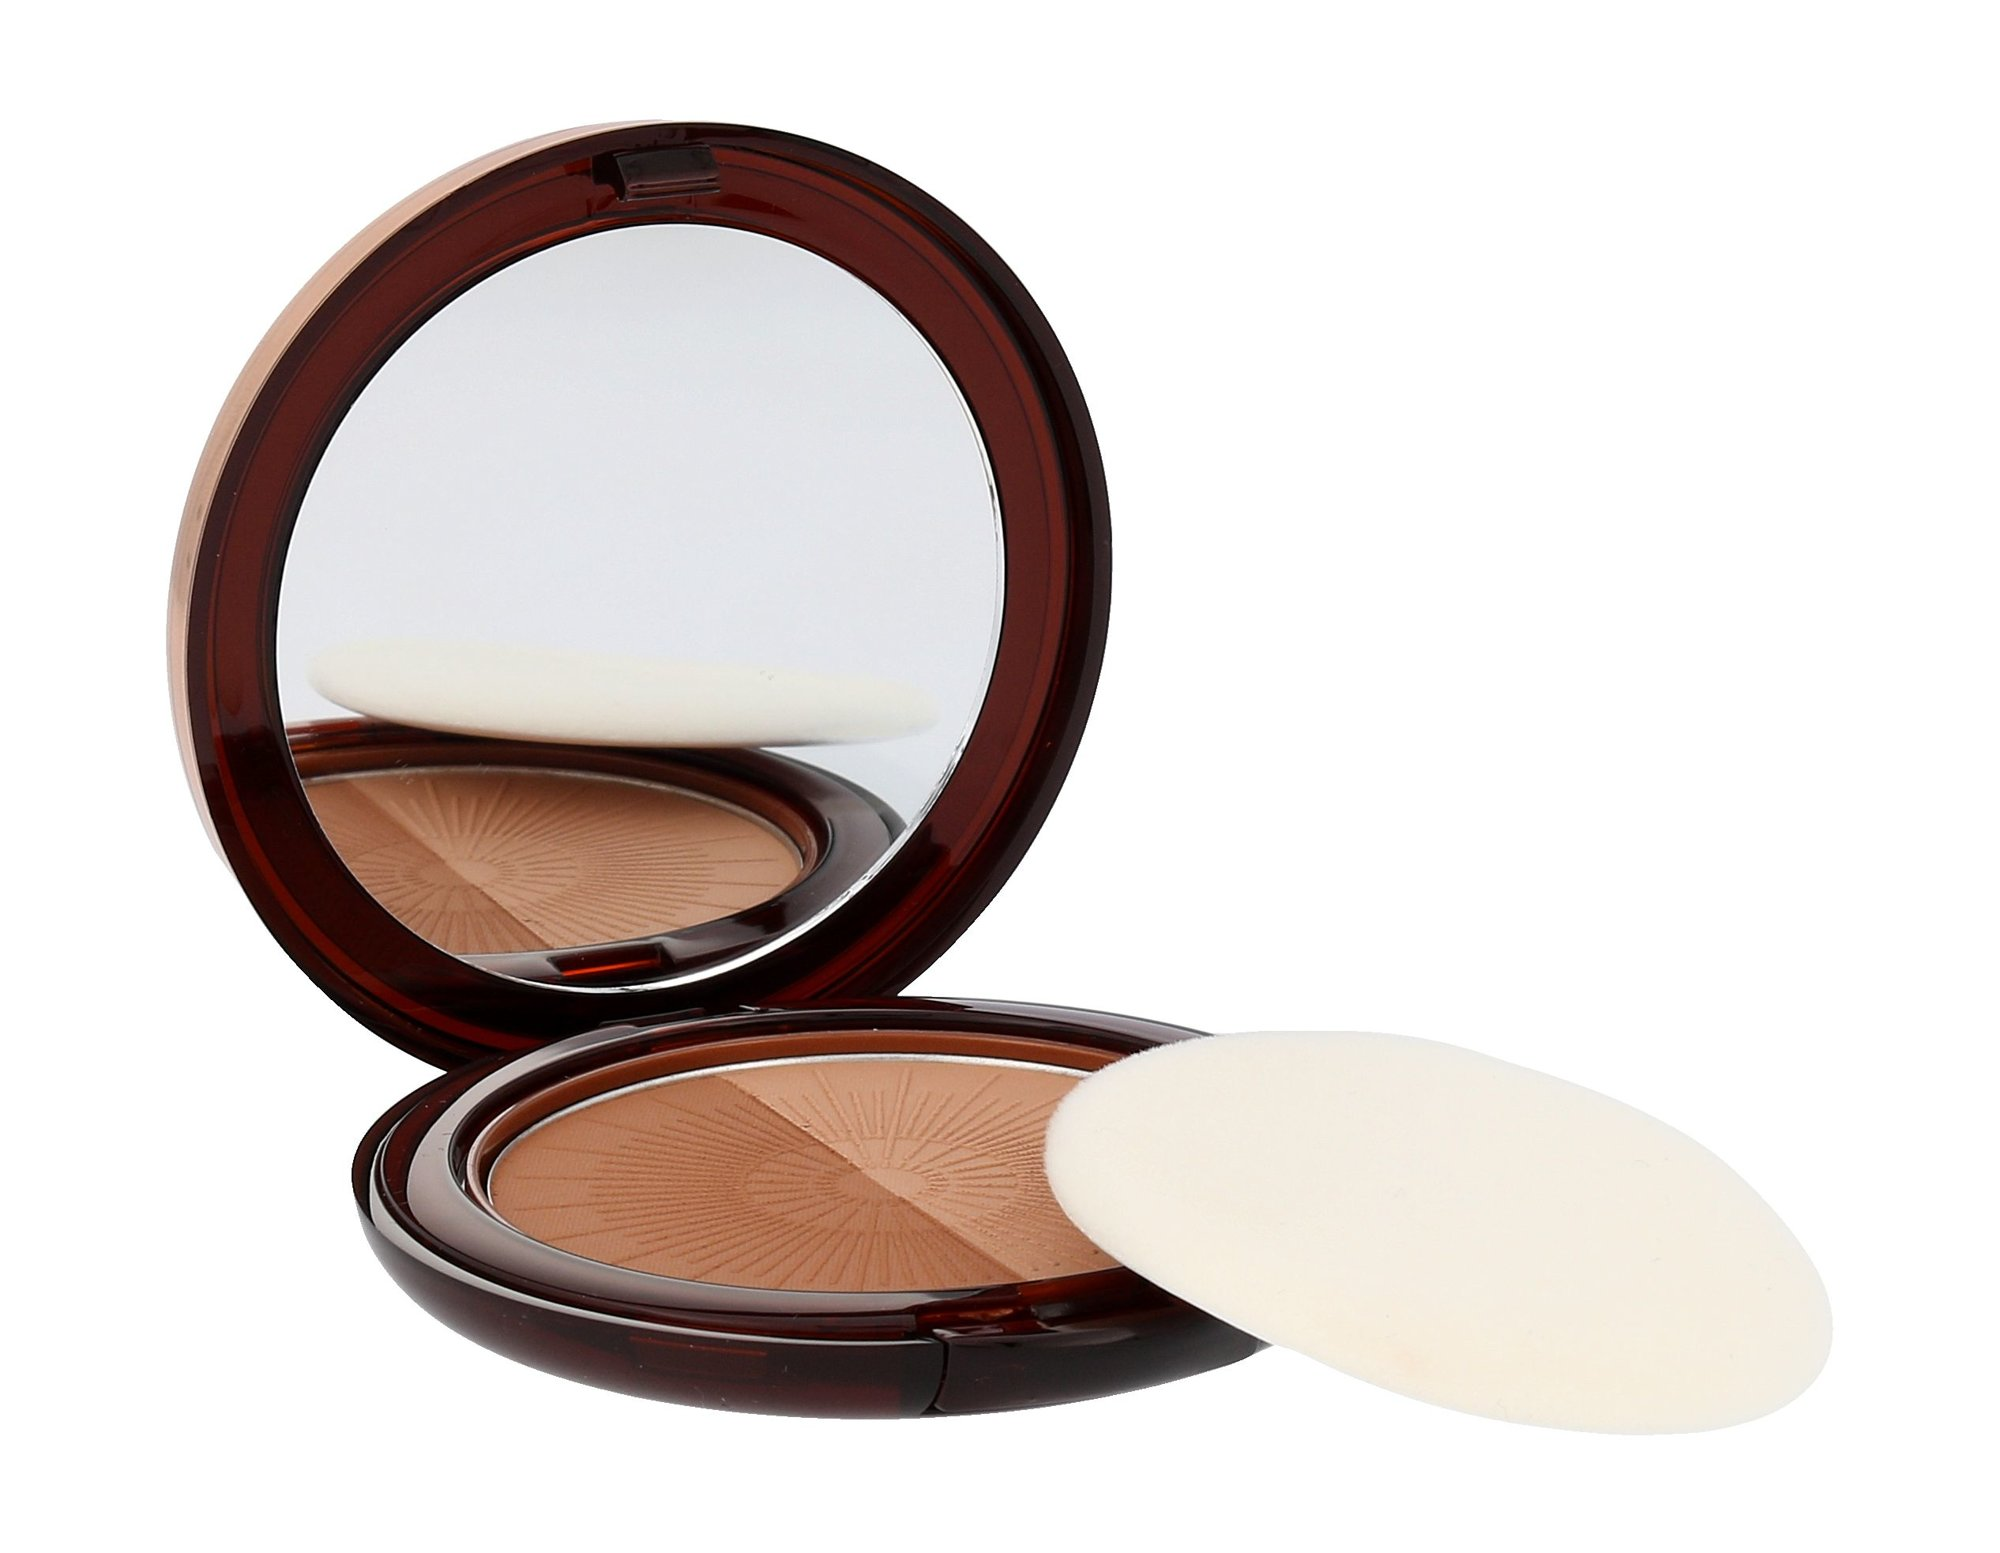 Artdeco Bronzing Powder Compact Cosmetic 10ml 50 Almond